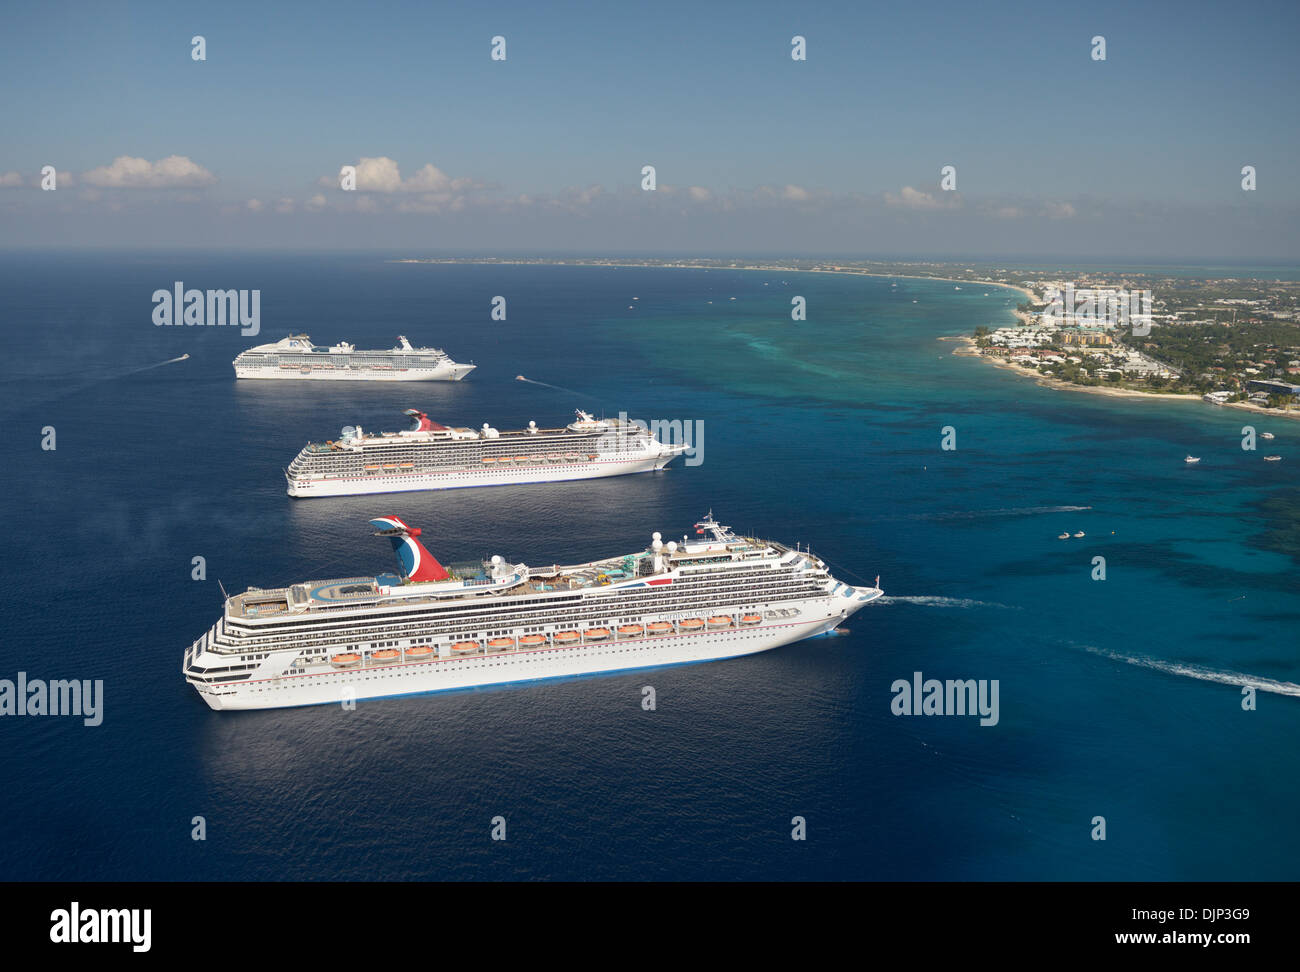 Navi da crociera Grand Cayman, Isole Cayman, British West Indies, Seven Mile Beach in background Immagini Stock